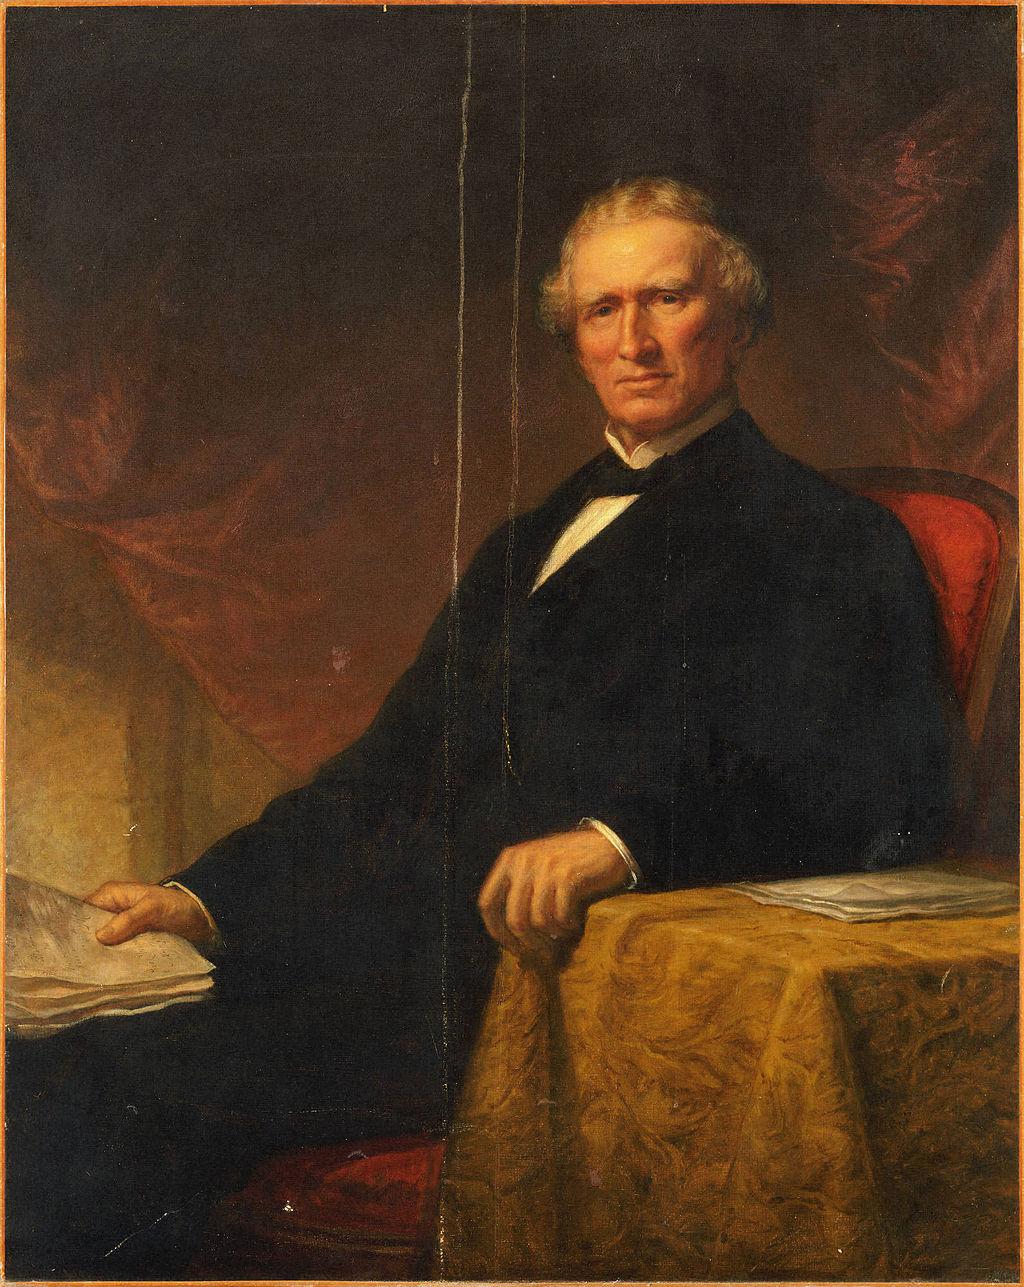 Princeton benefactor John Cleve Green in 1870.